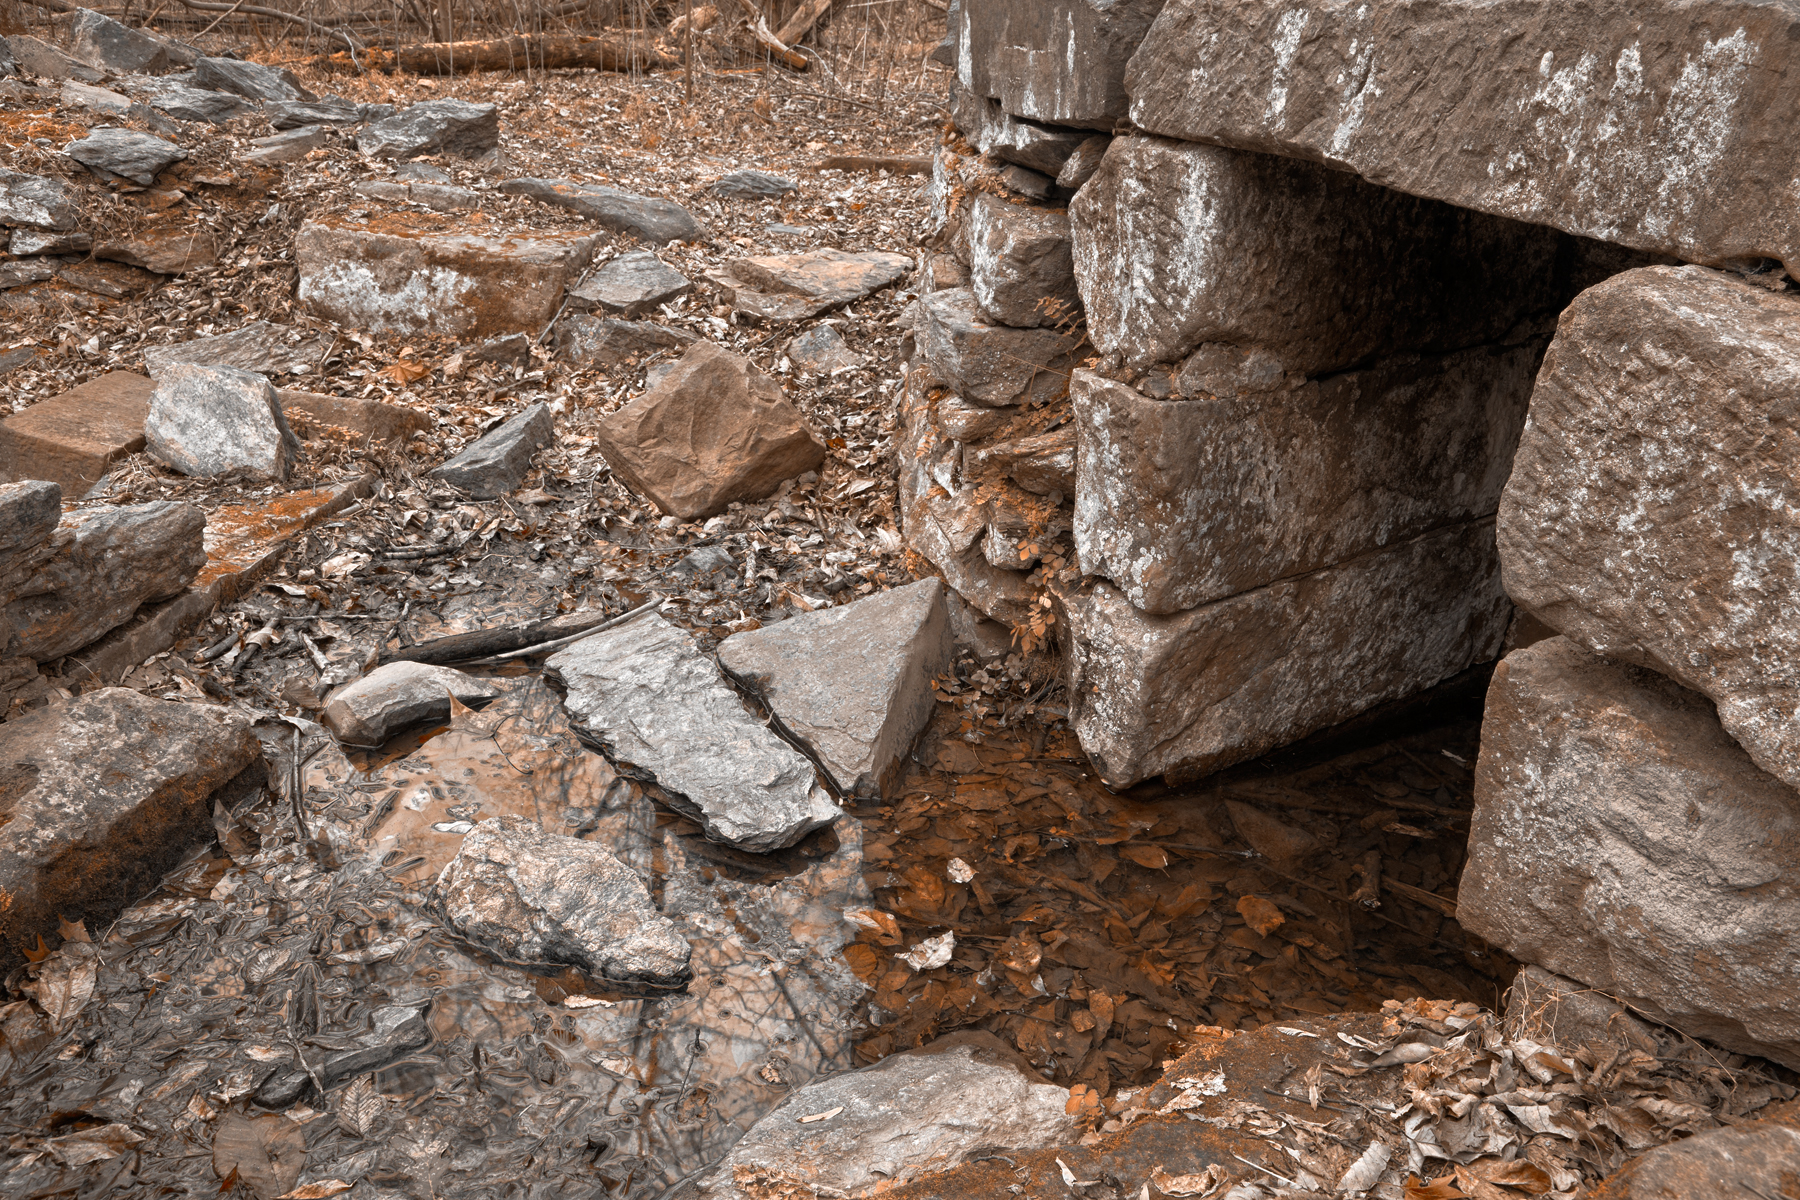 Rustic ruins - hdr photo